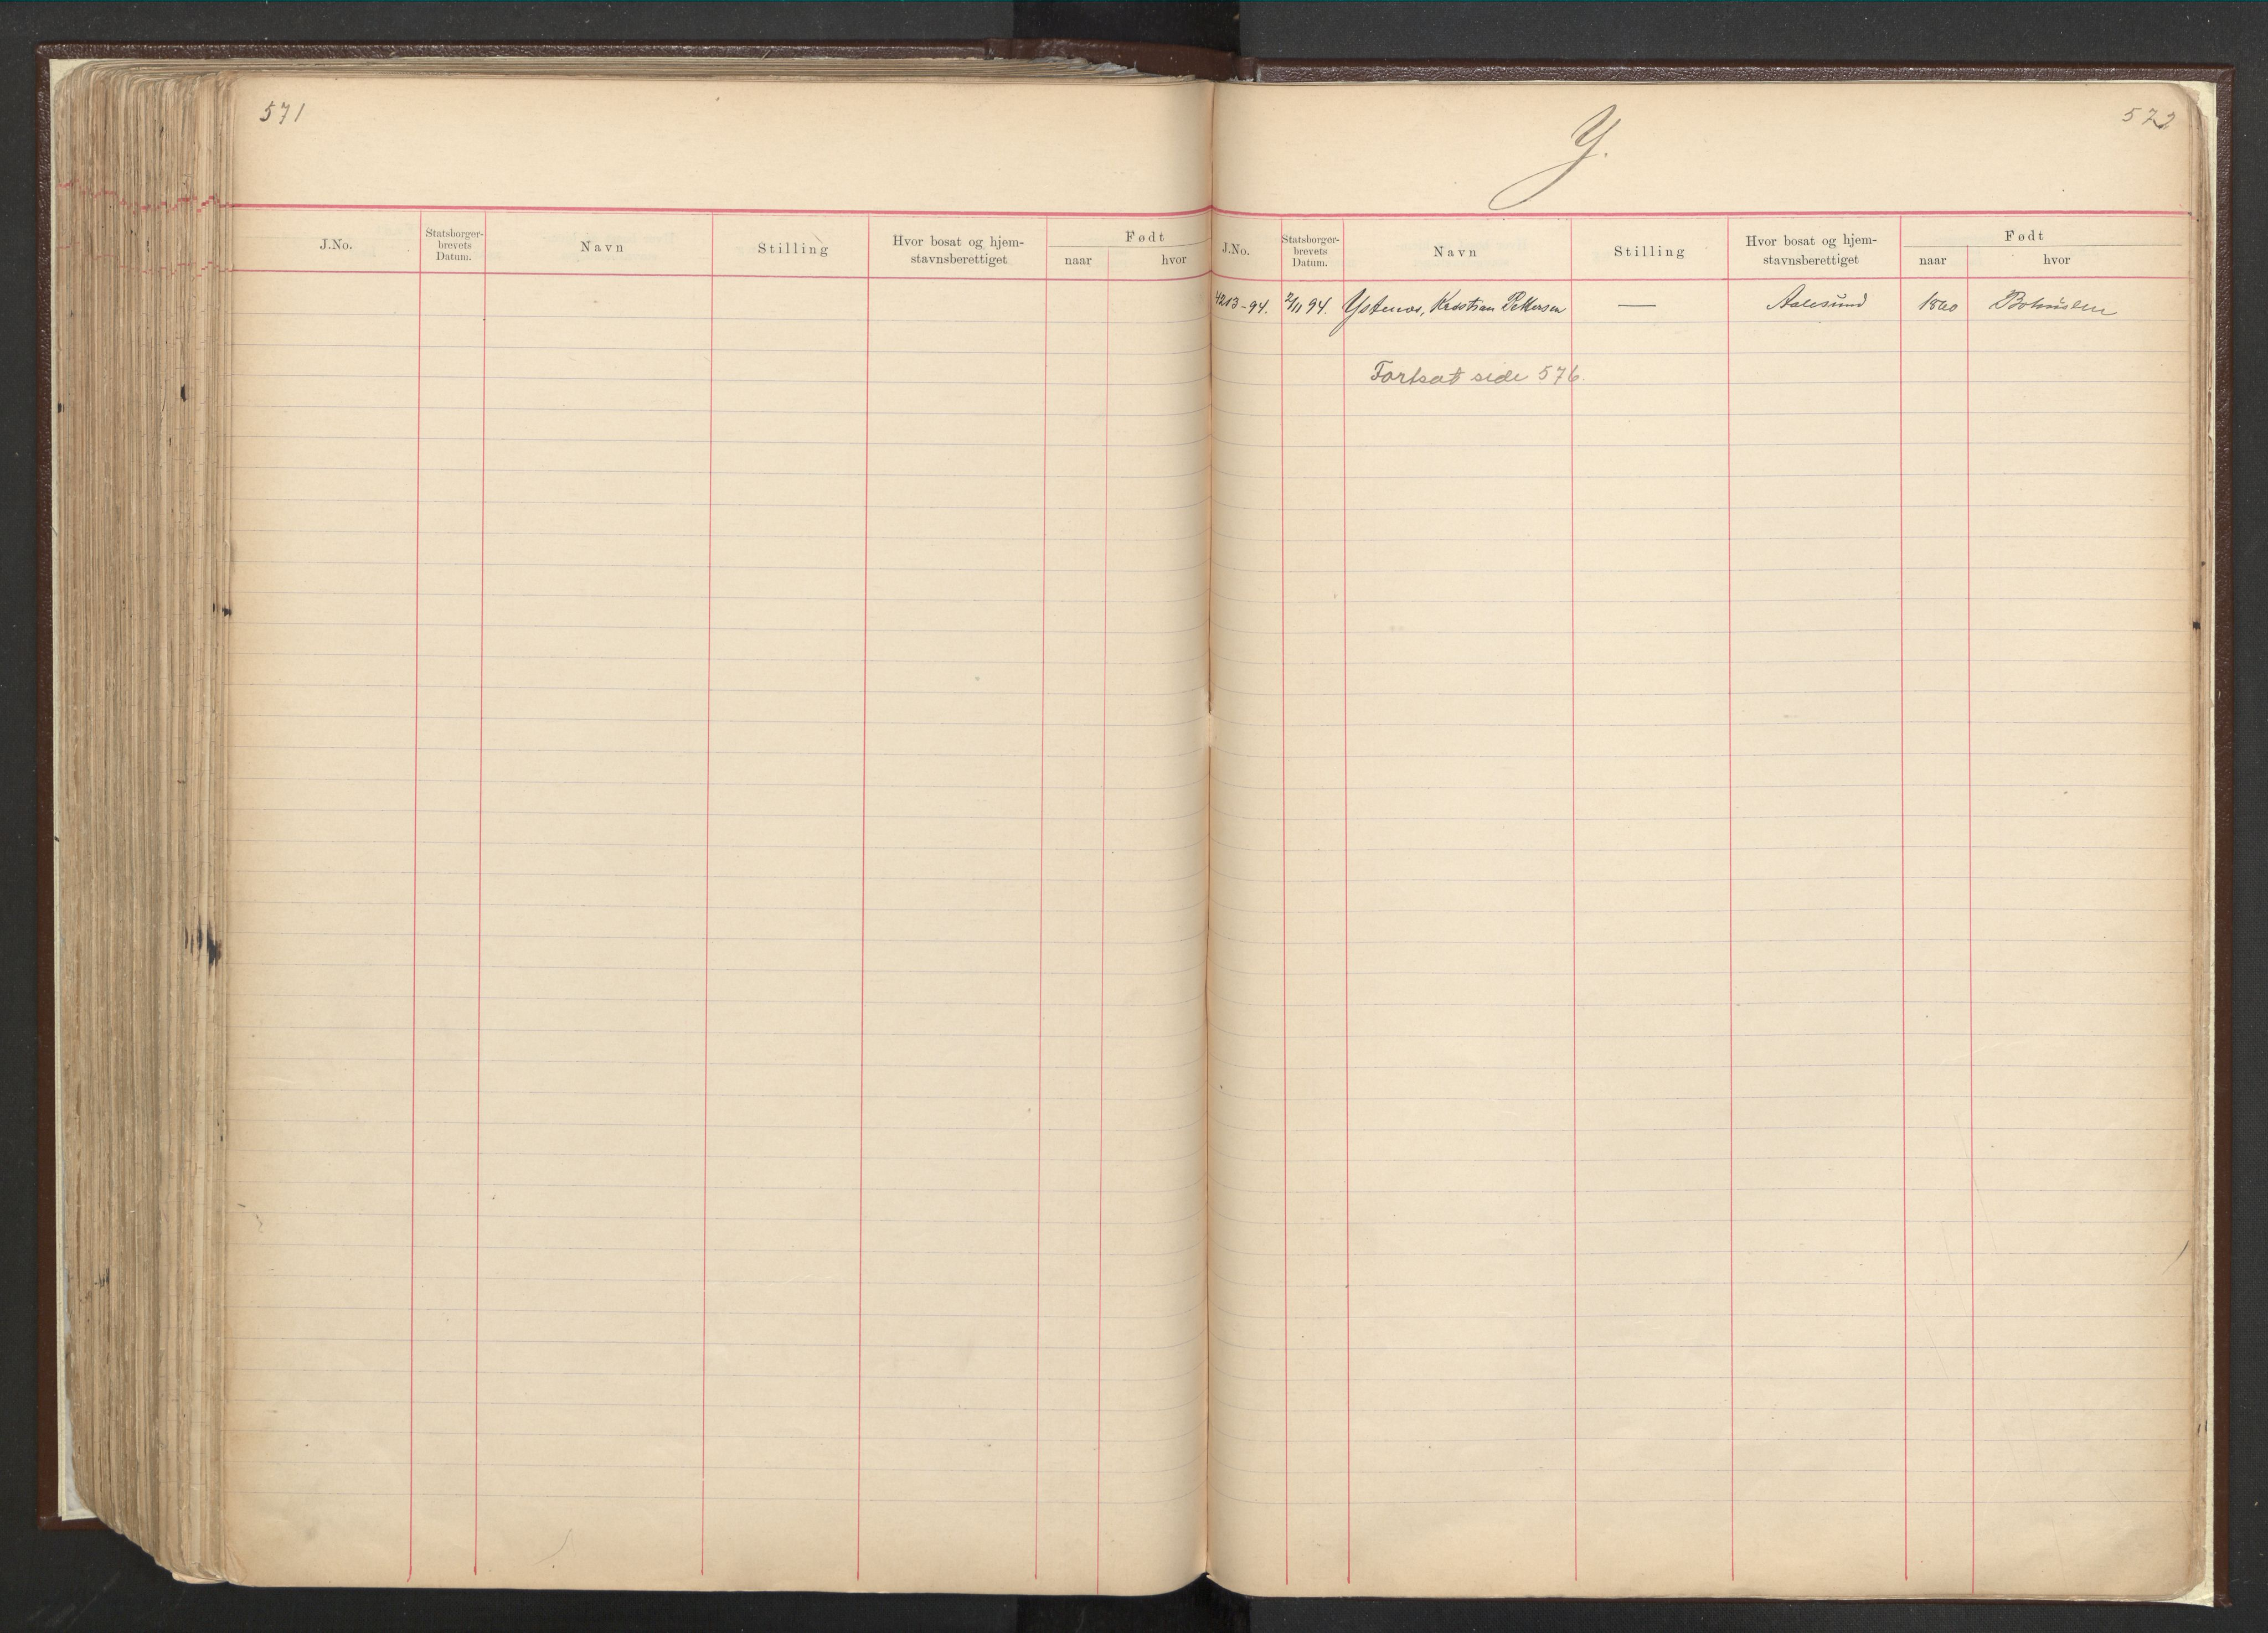 RA, Justisdepartementet, 3. politikontor P3, C/Cc/L0001: Journal over statsborgersaker, 1891-1946, s. 571-572